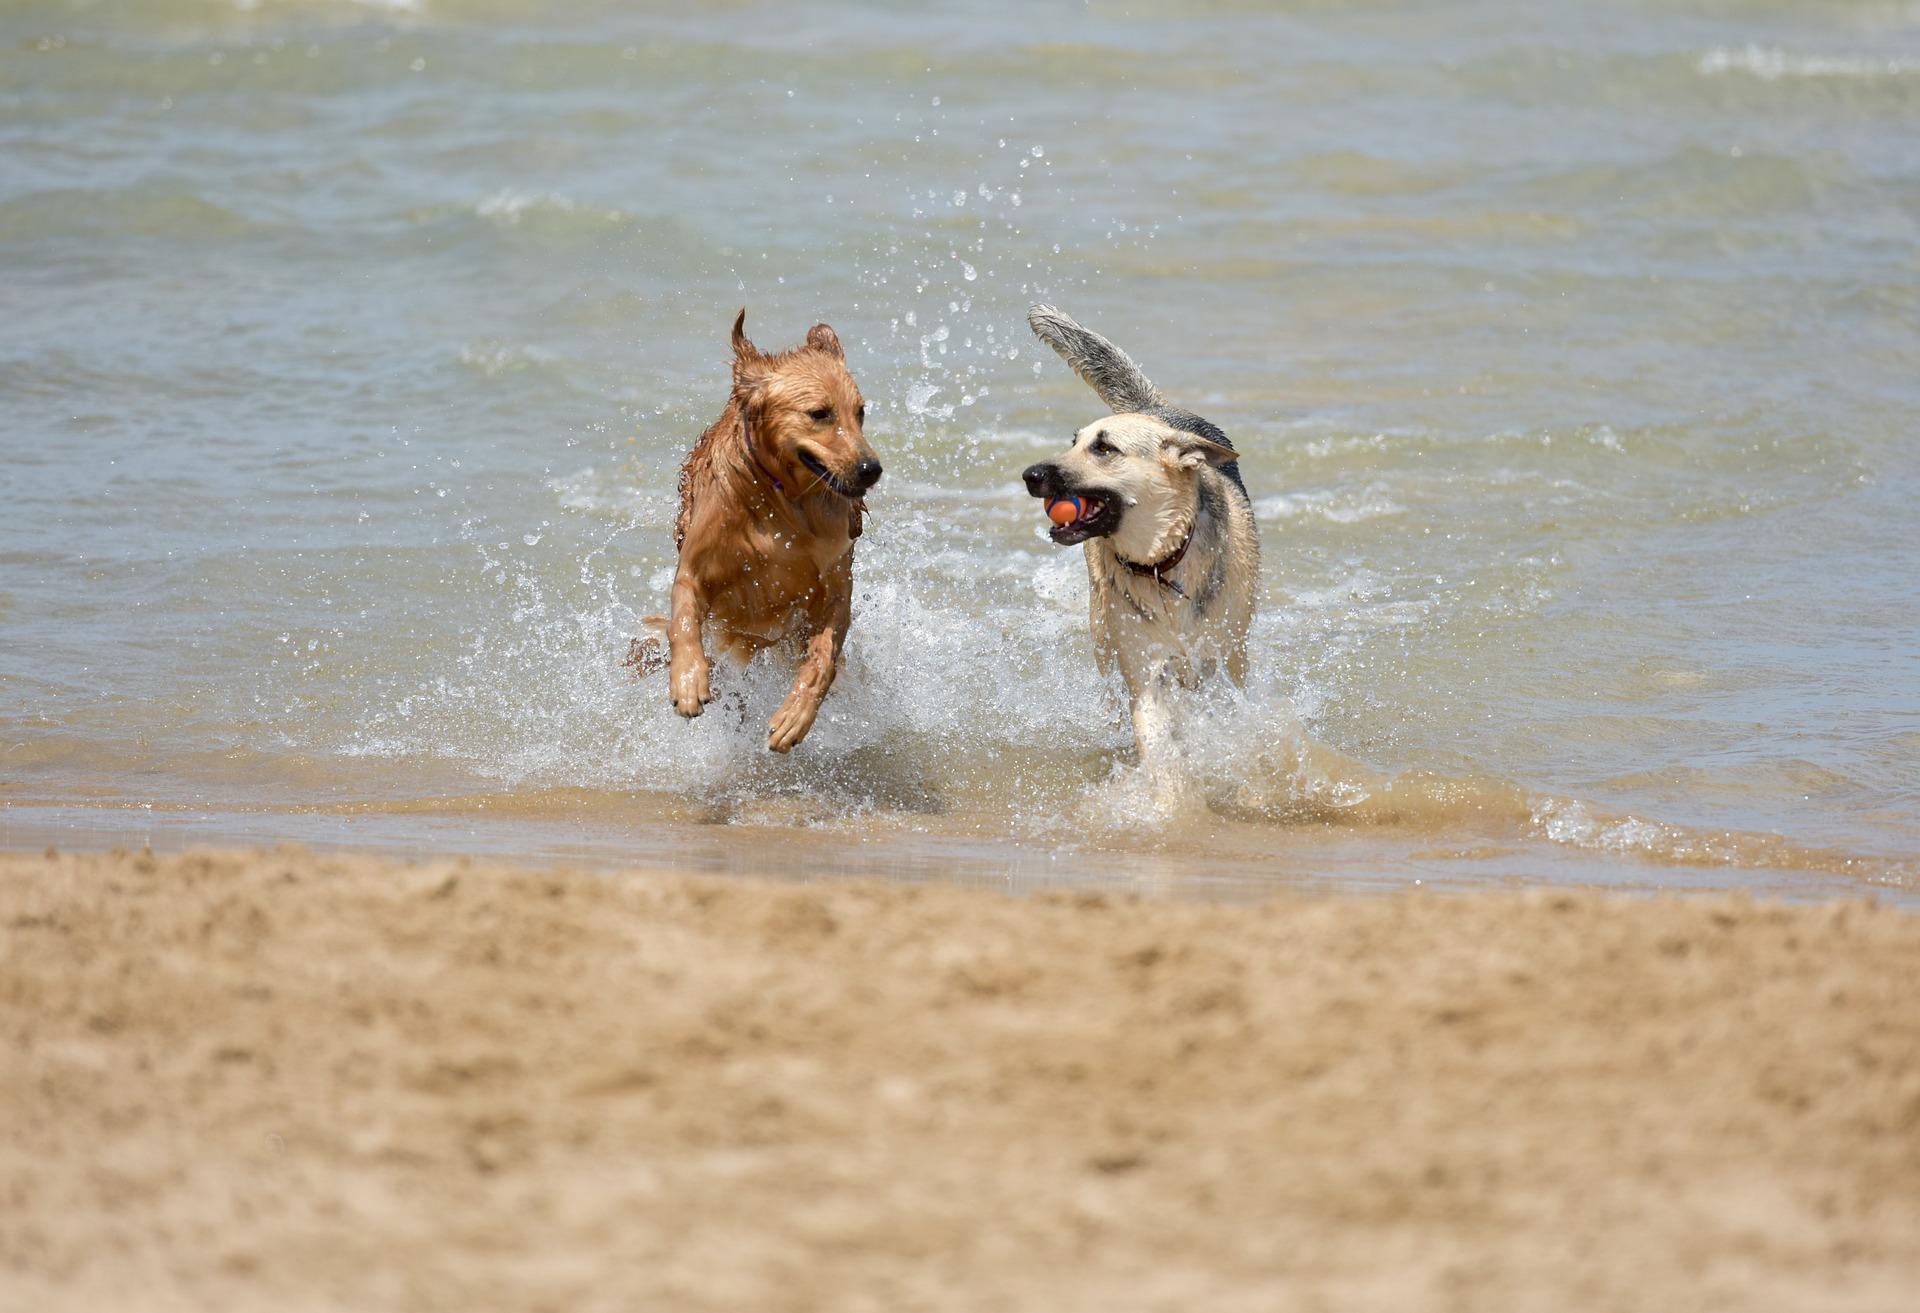 Rimini: via libera ai cani in spiaggia